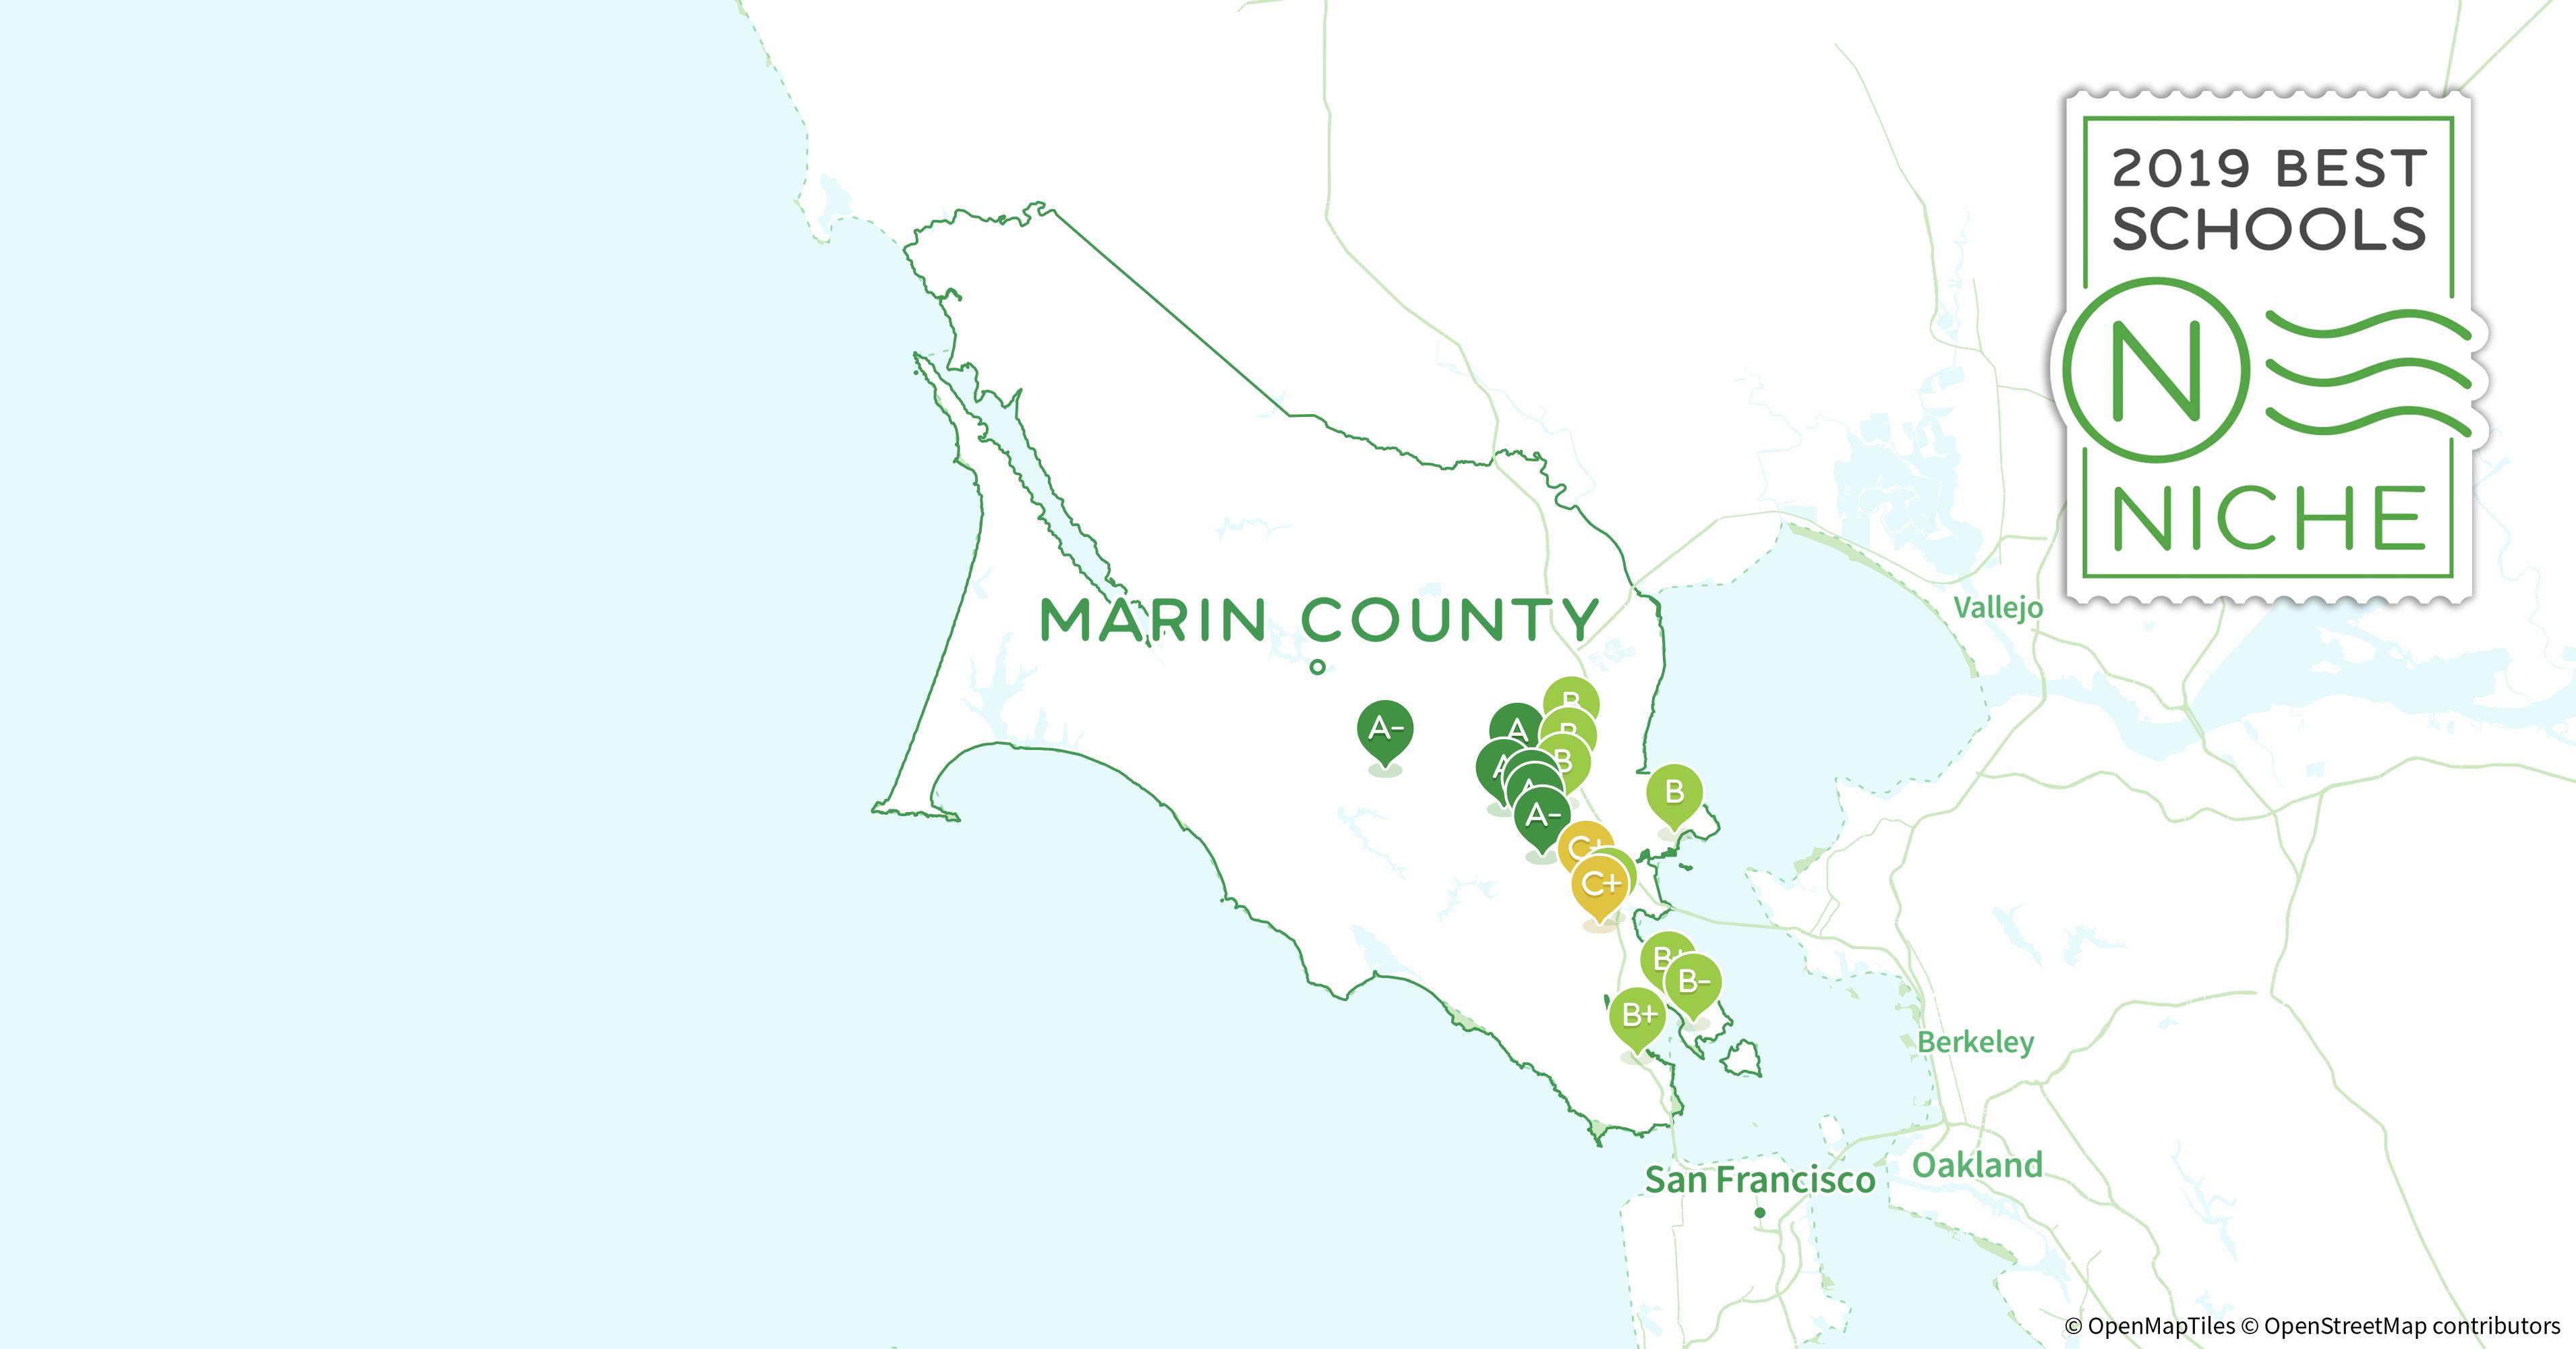 School Districts In Marin County Ca Niche